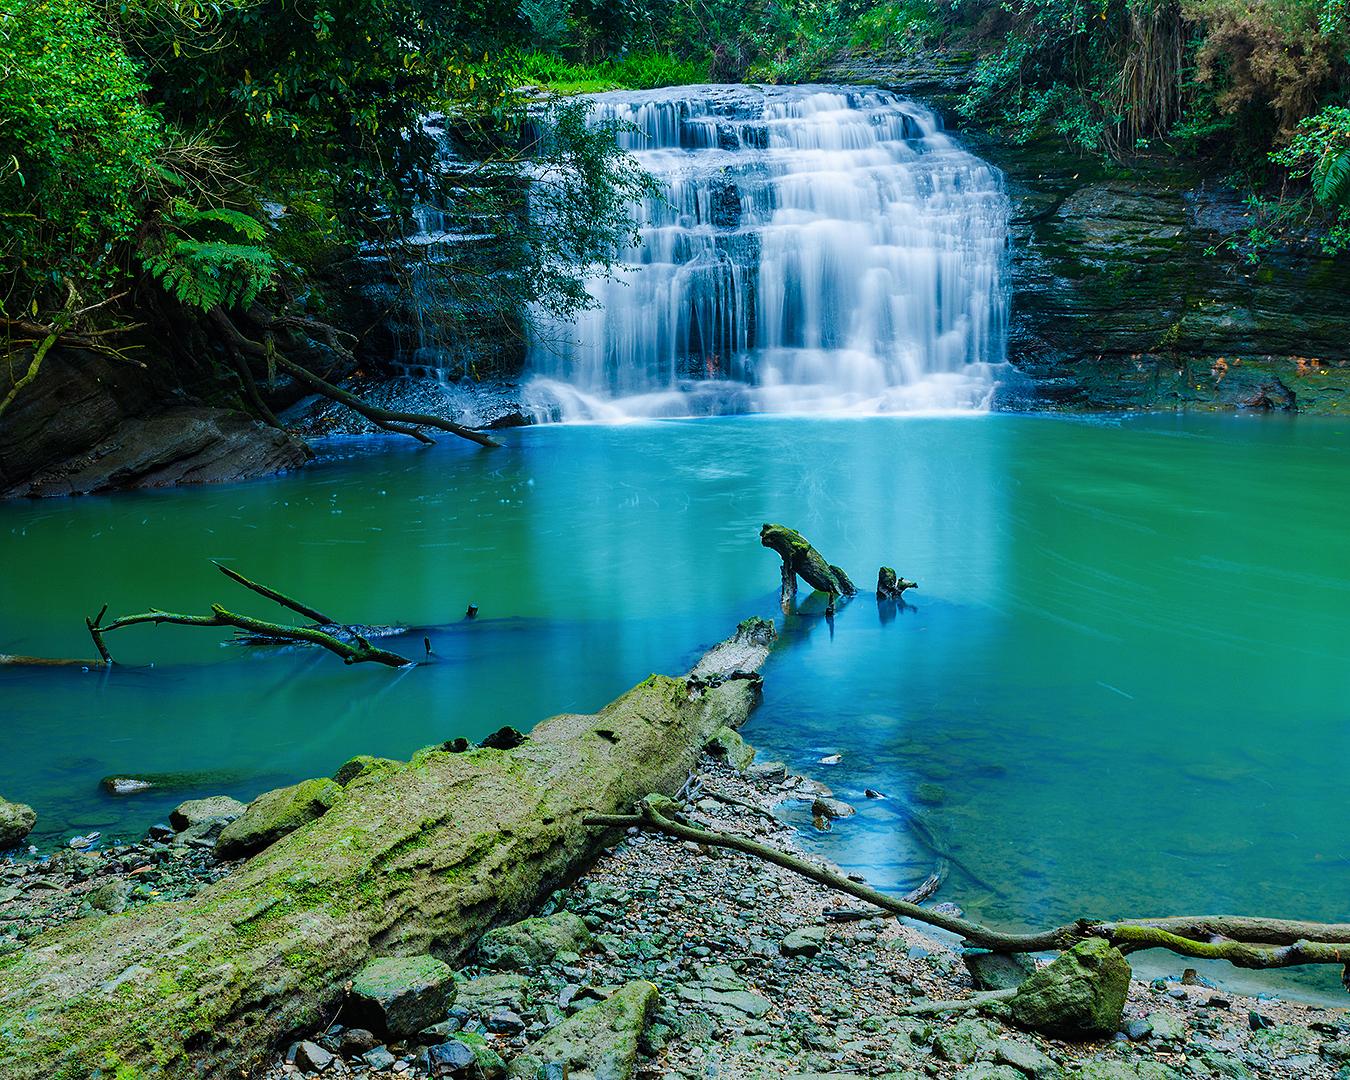 Lucas Creek Waterfall looks oh so inviting.